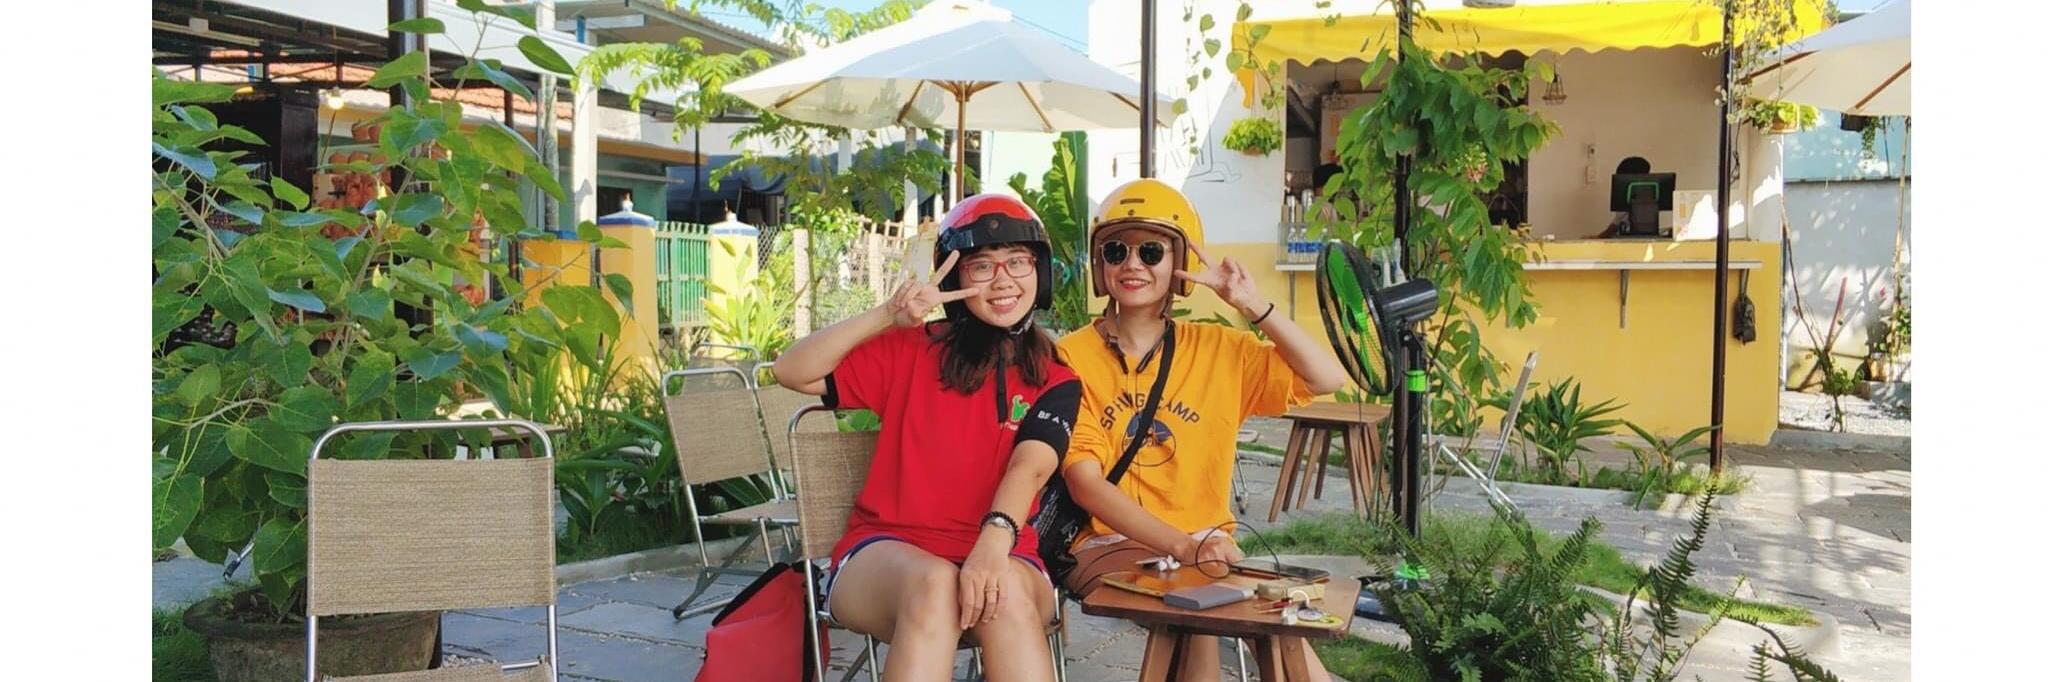 https://gody.vn/blog/congchua_mauhong803174/post/ngoi-ca-phe-bo-song-tai-sao-khong-9039